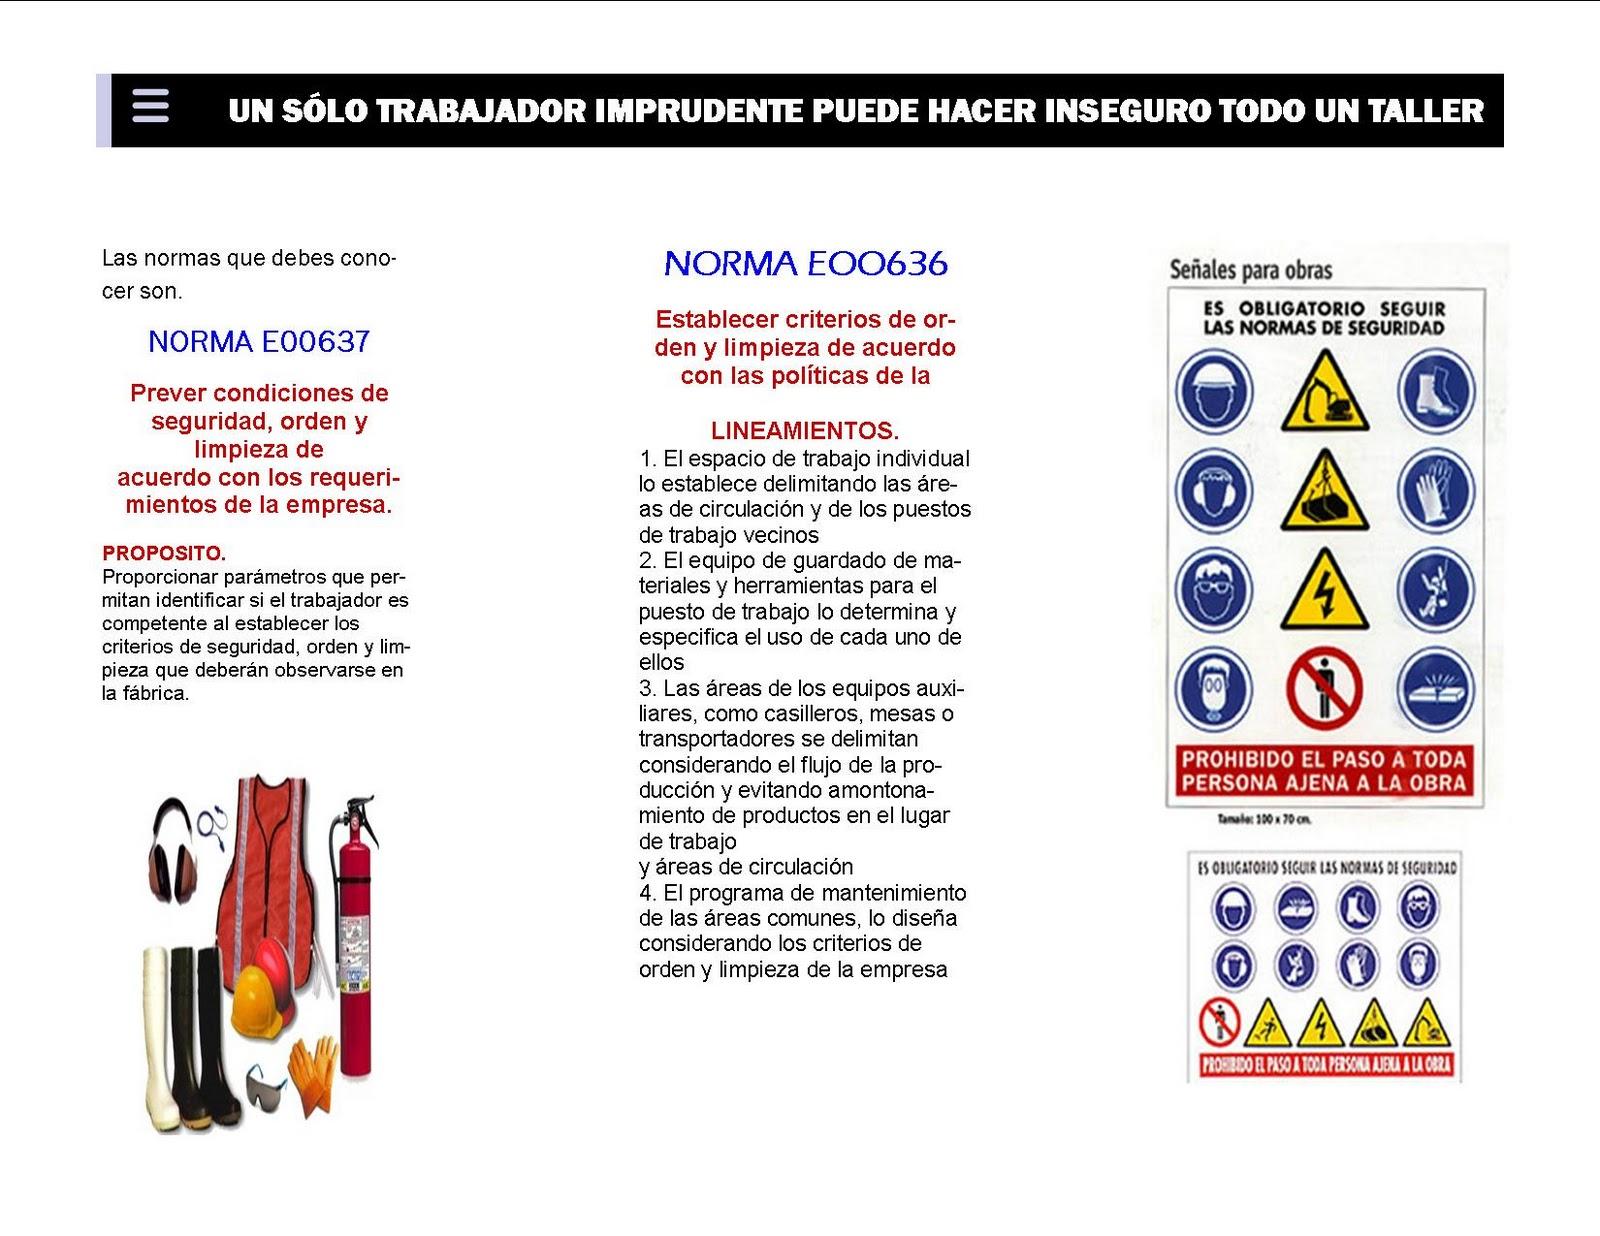 franciscojavierzarate: Triptico de seguridad e higiene tarea Alejandra